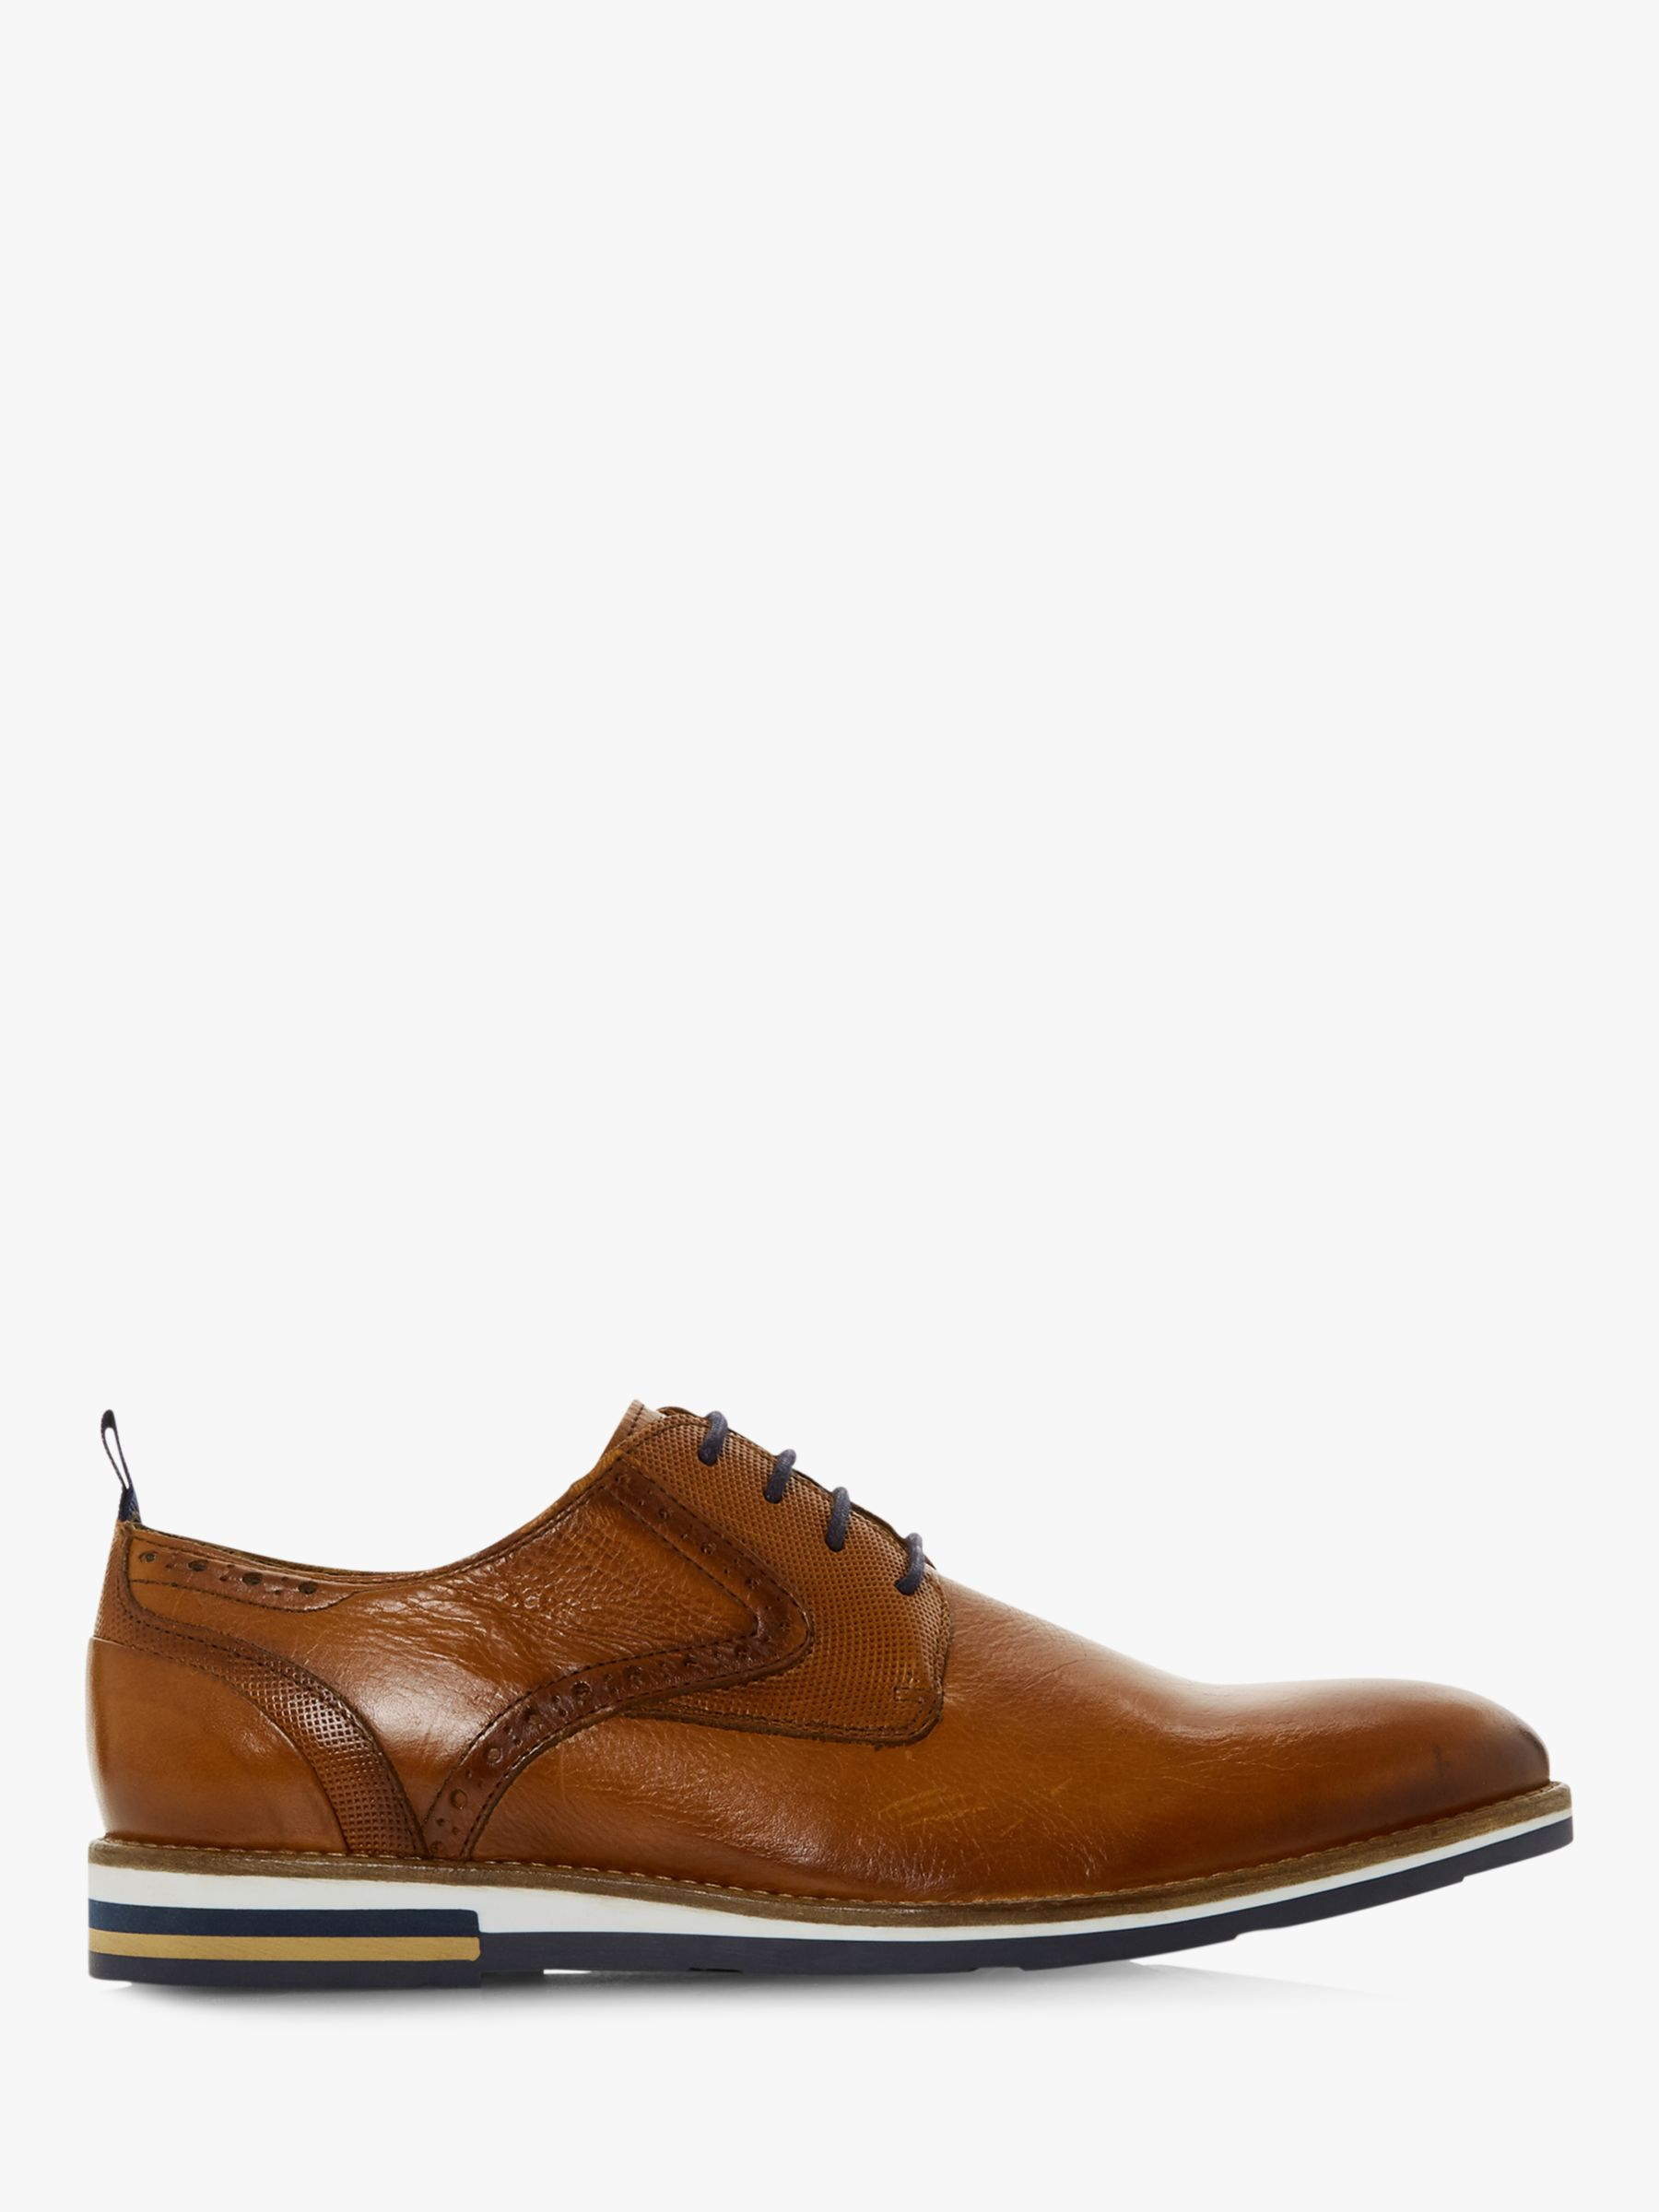 Bertie Bertie Blackfriar Contrast Sole Derby Shoes, Tan